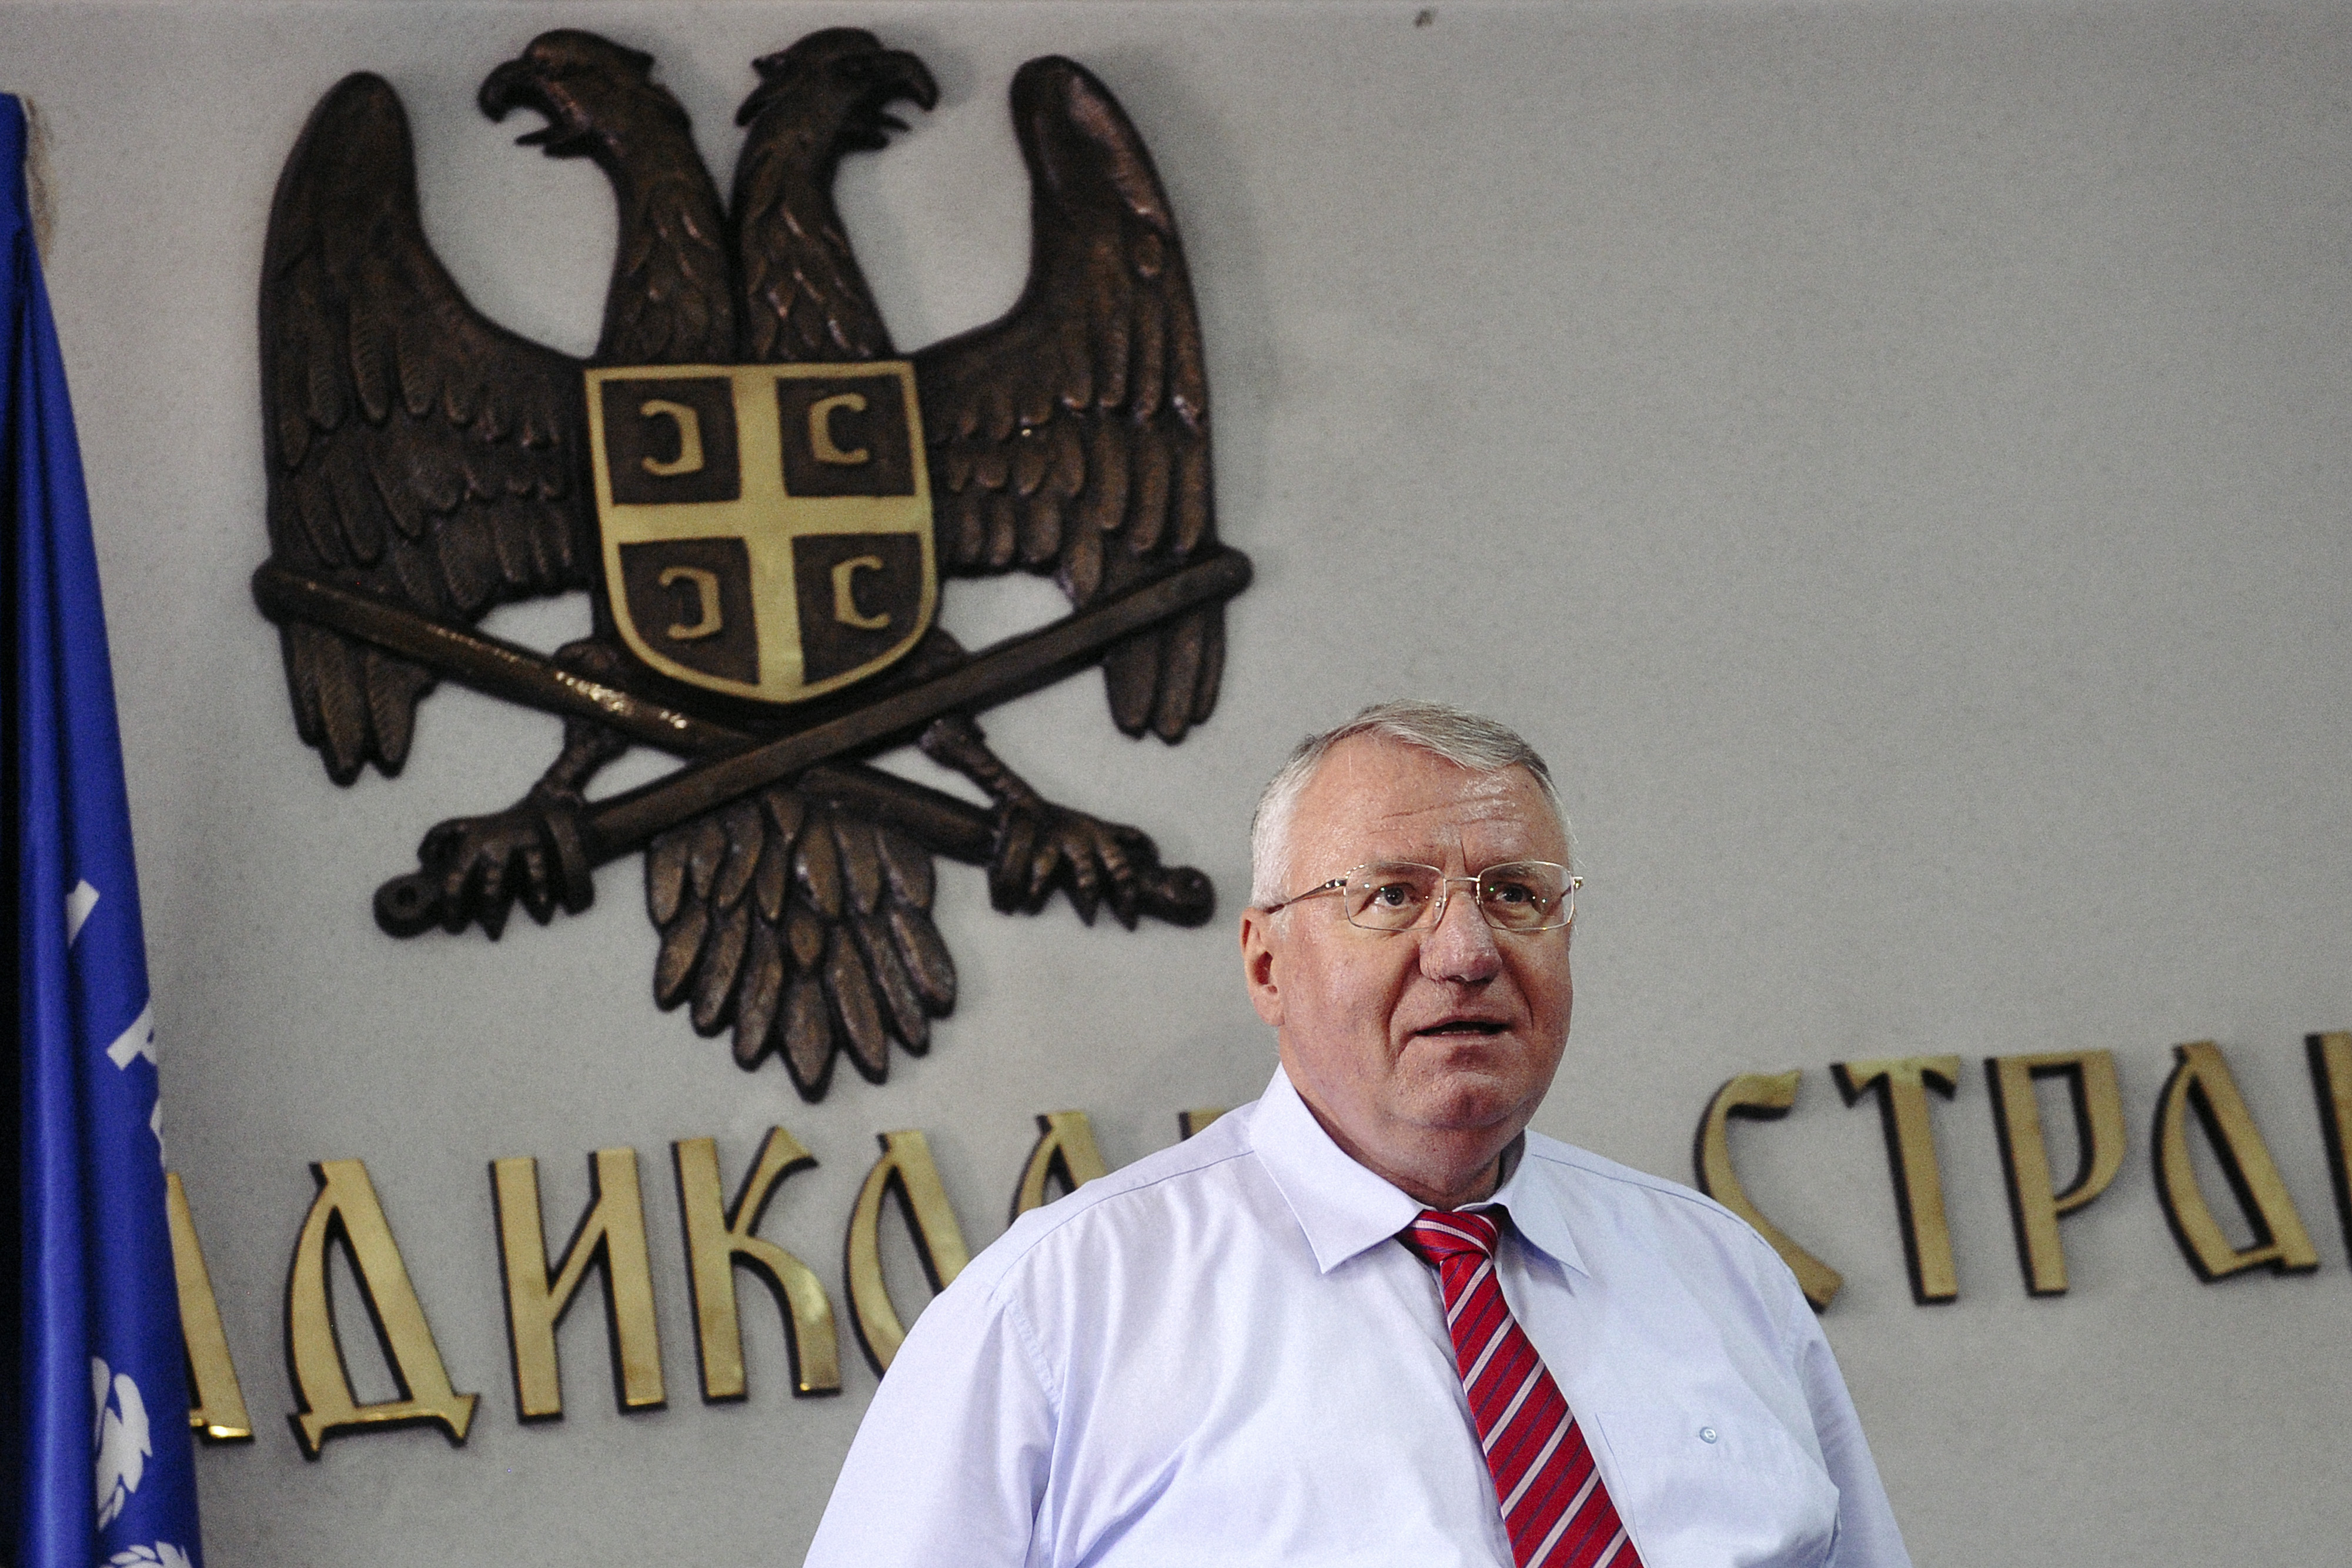 Mégis elítélték Vojislav Šešelj csetnikvezért